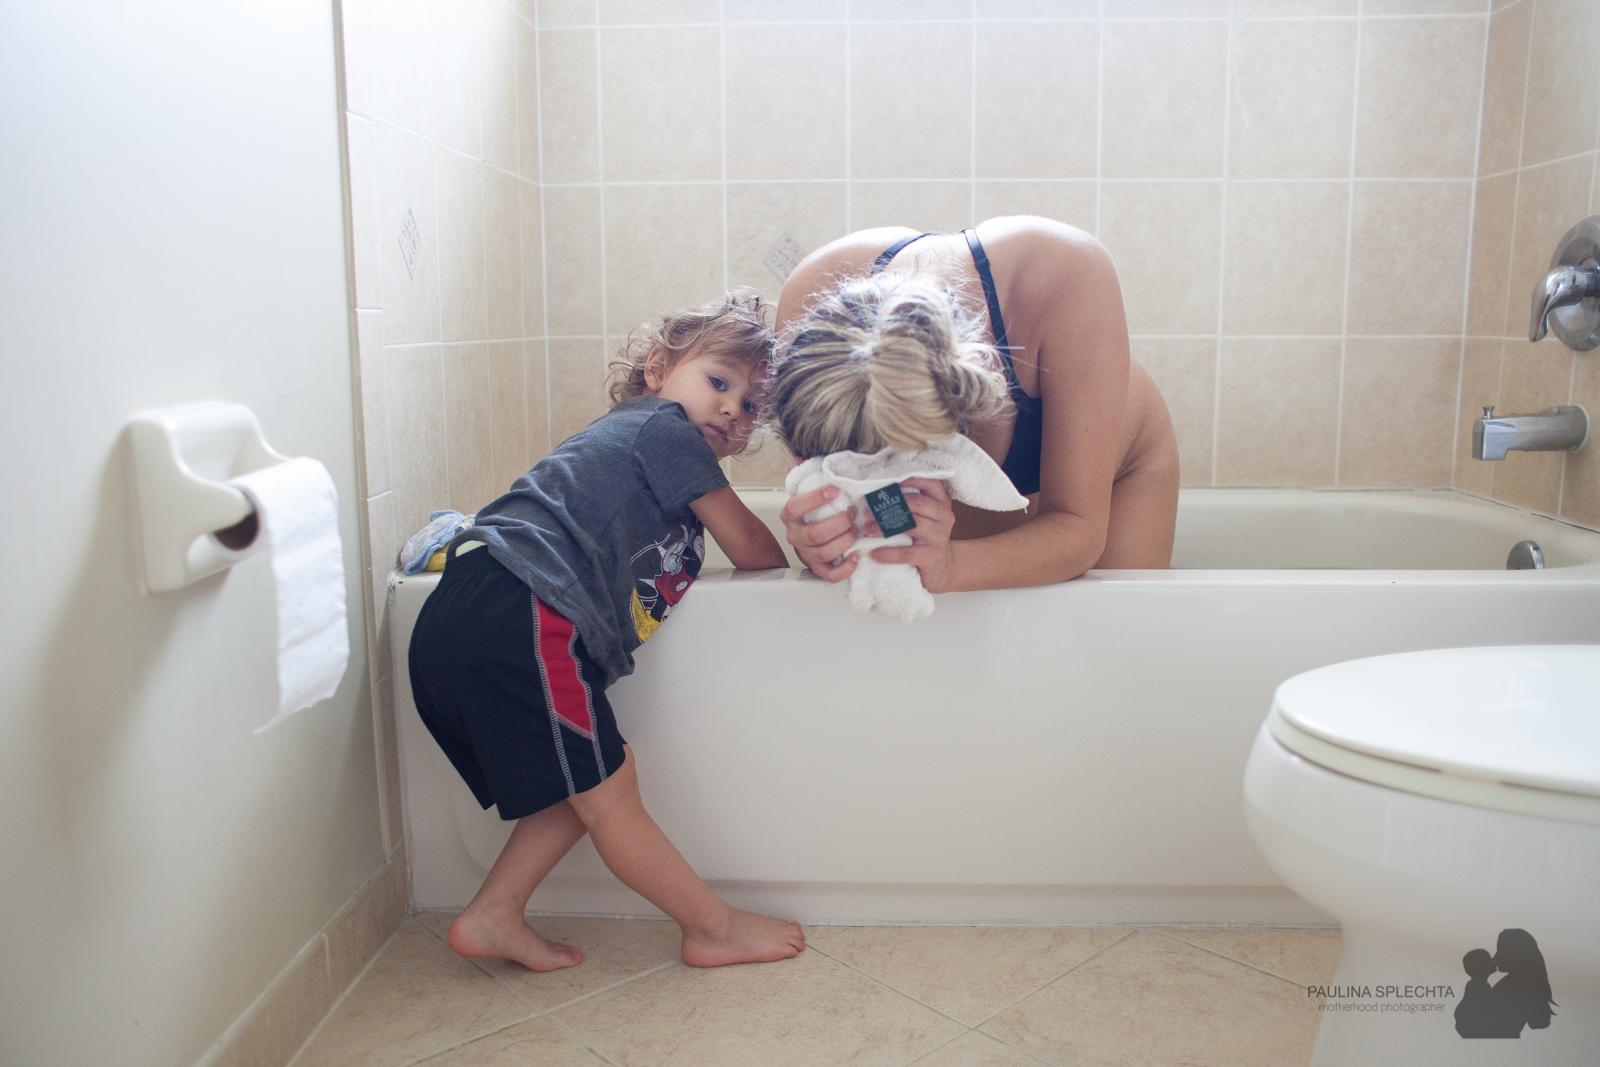 bocabirthphotographer-boca-birth-photographer-birth-center-hospital-hypnobirthing-midwife-doula-trimester-breastfeeding-florida-hollywood-delray-stop-nausea-morning-sickness-2.jpg